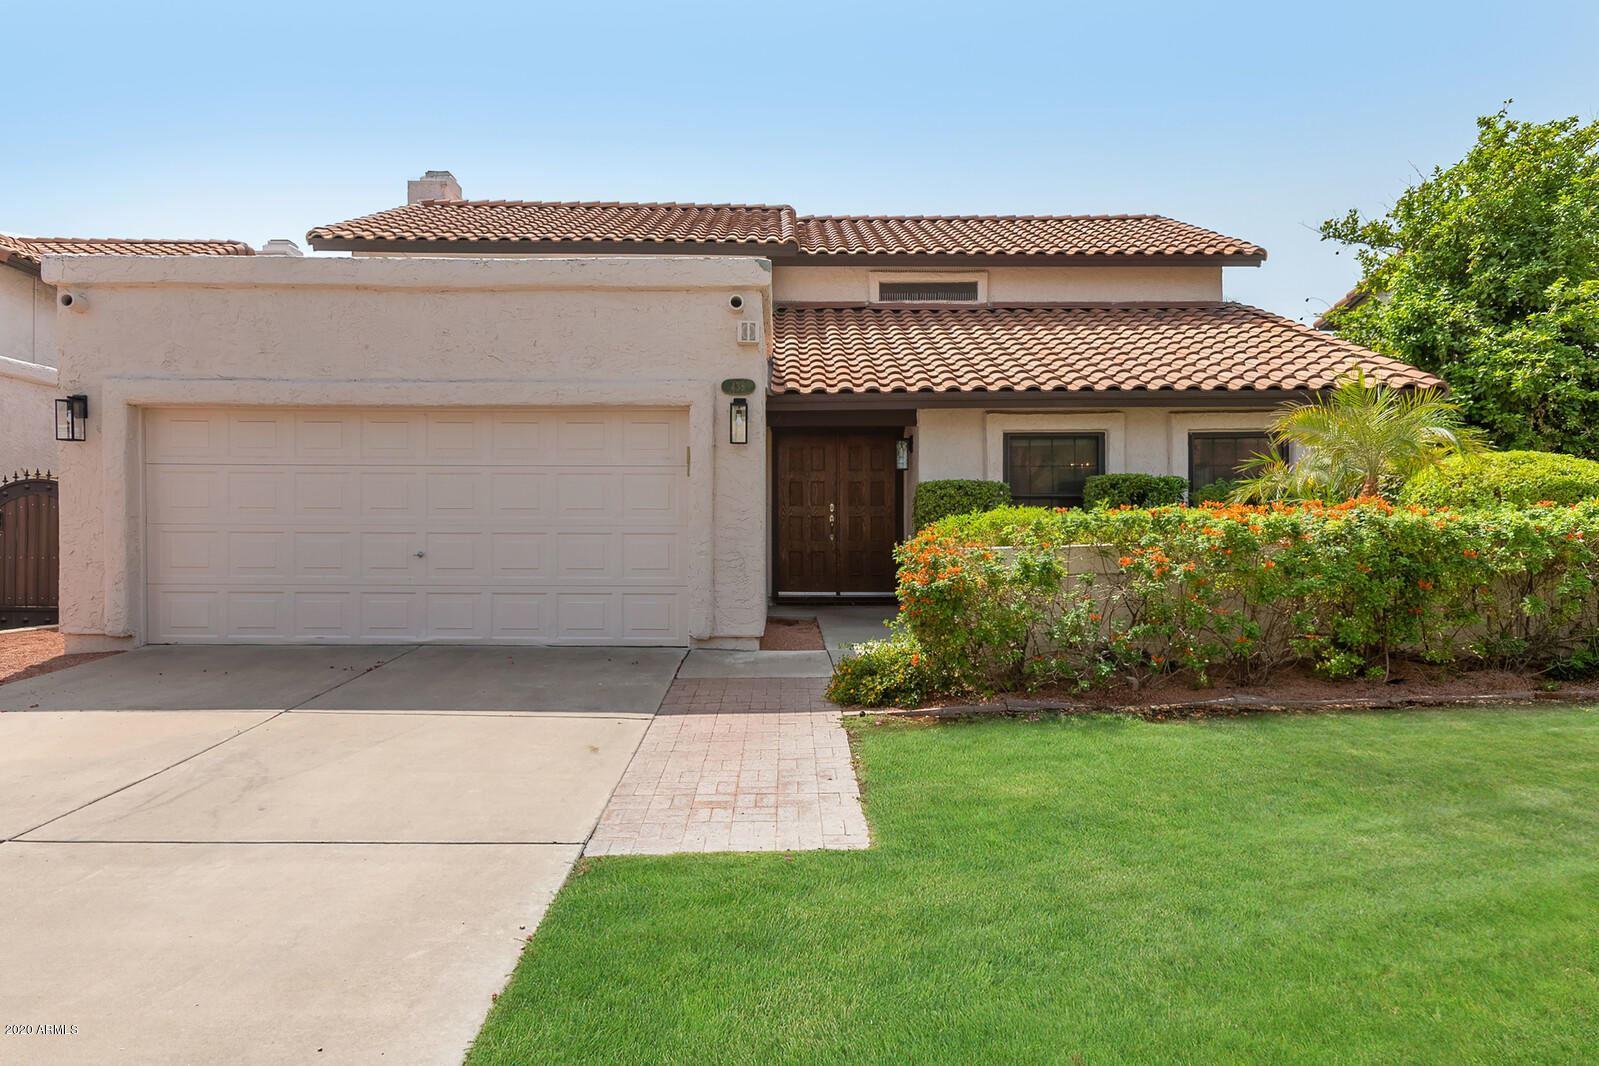 439 E BARBARA Drive, Tempe, AZ 85281 - MLS#: 6134887